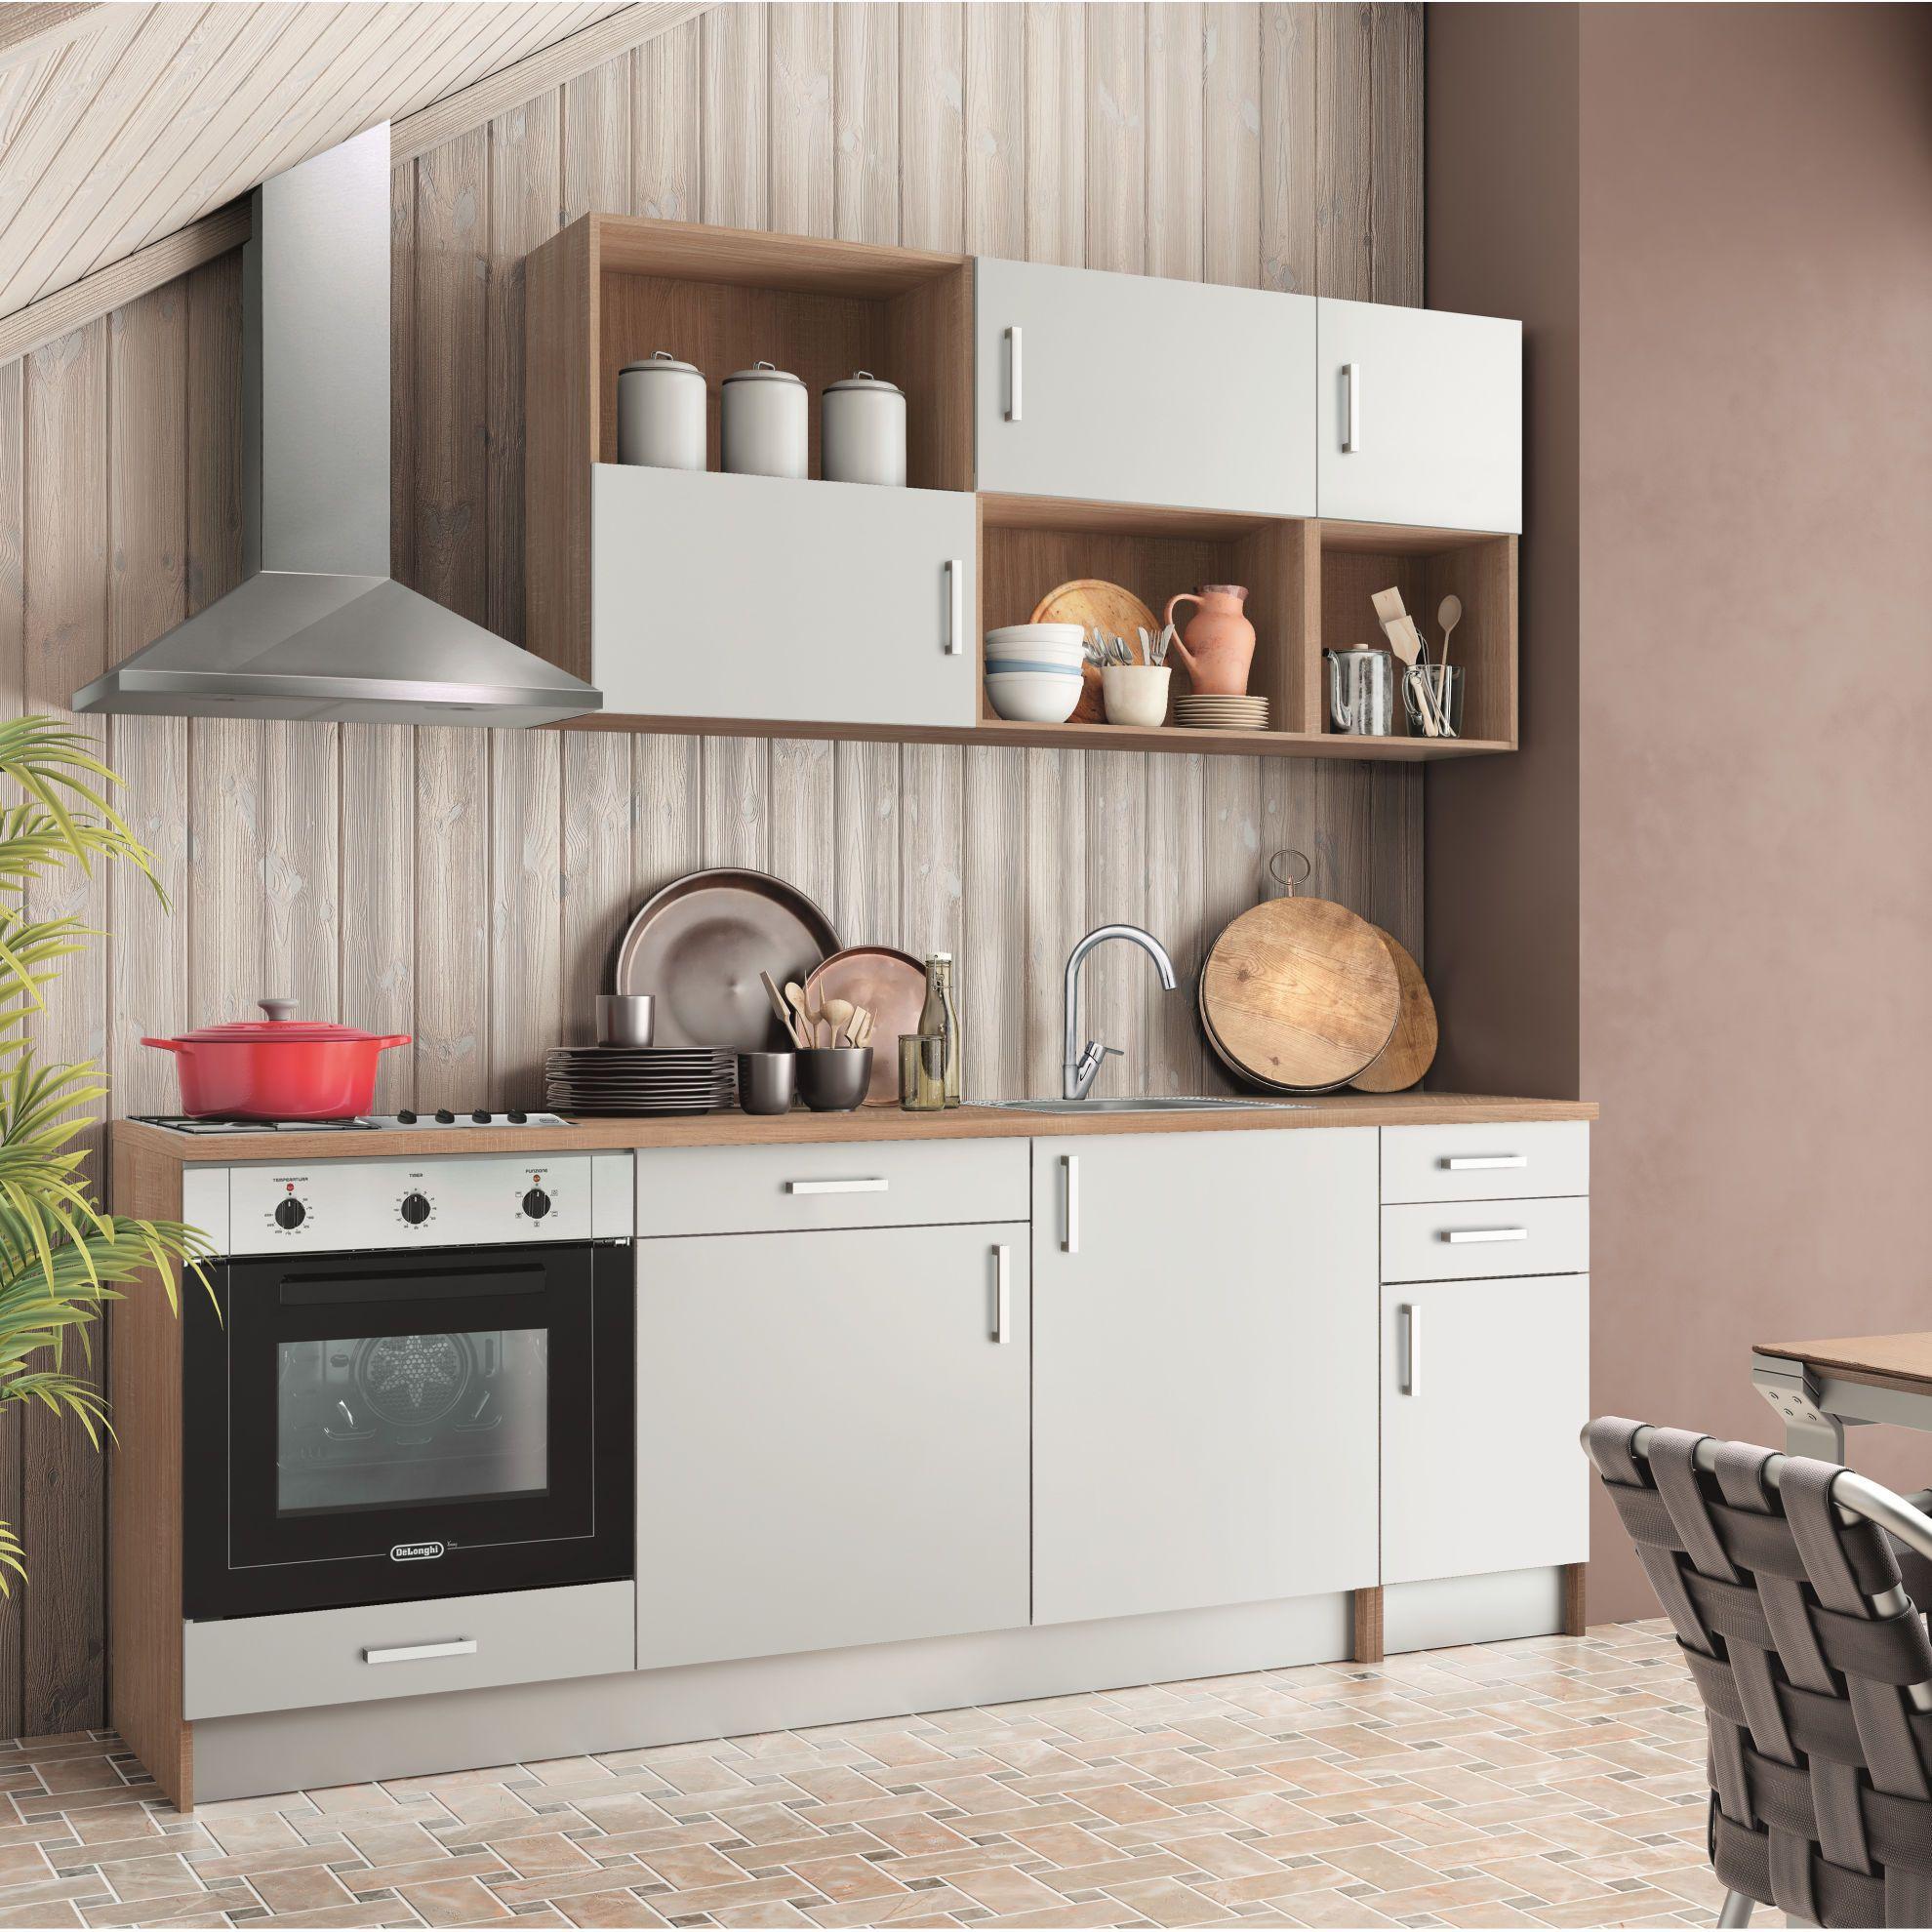 Cucina One bianco L 220 cm | Kitchen cabinets, Kitchen, Home ...